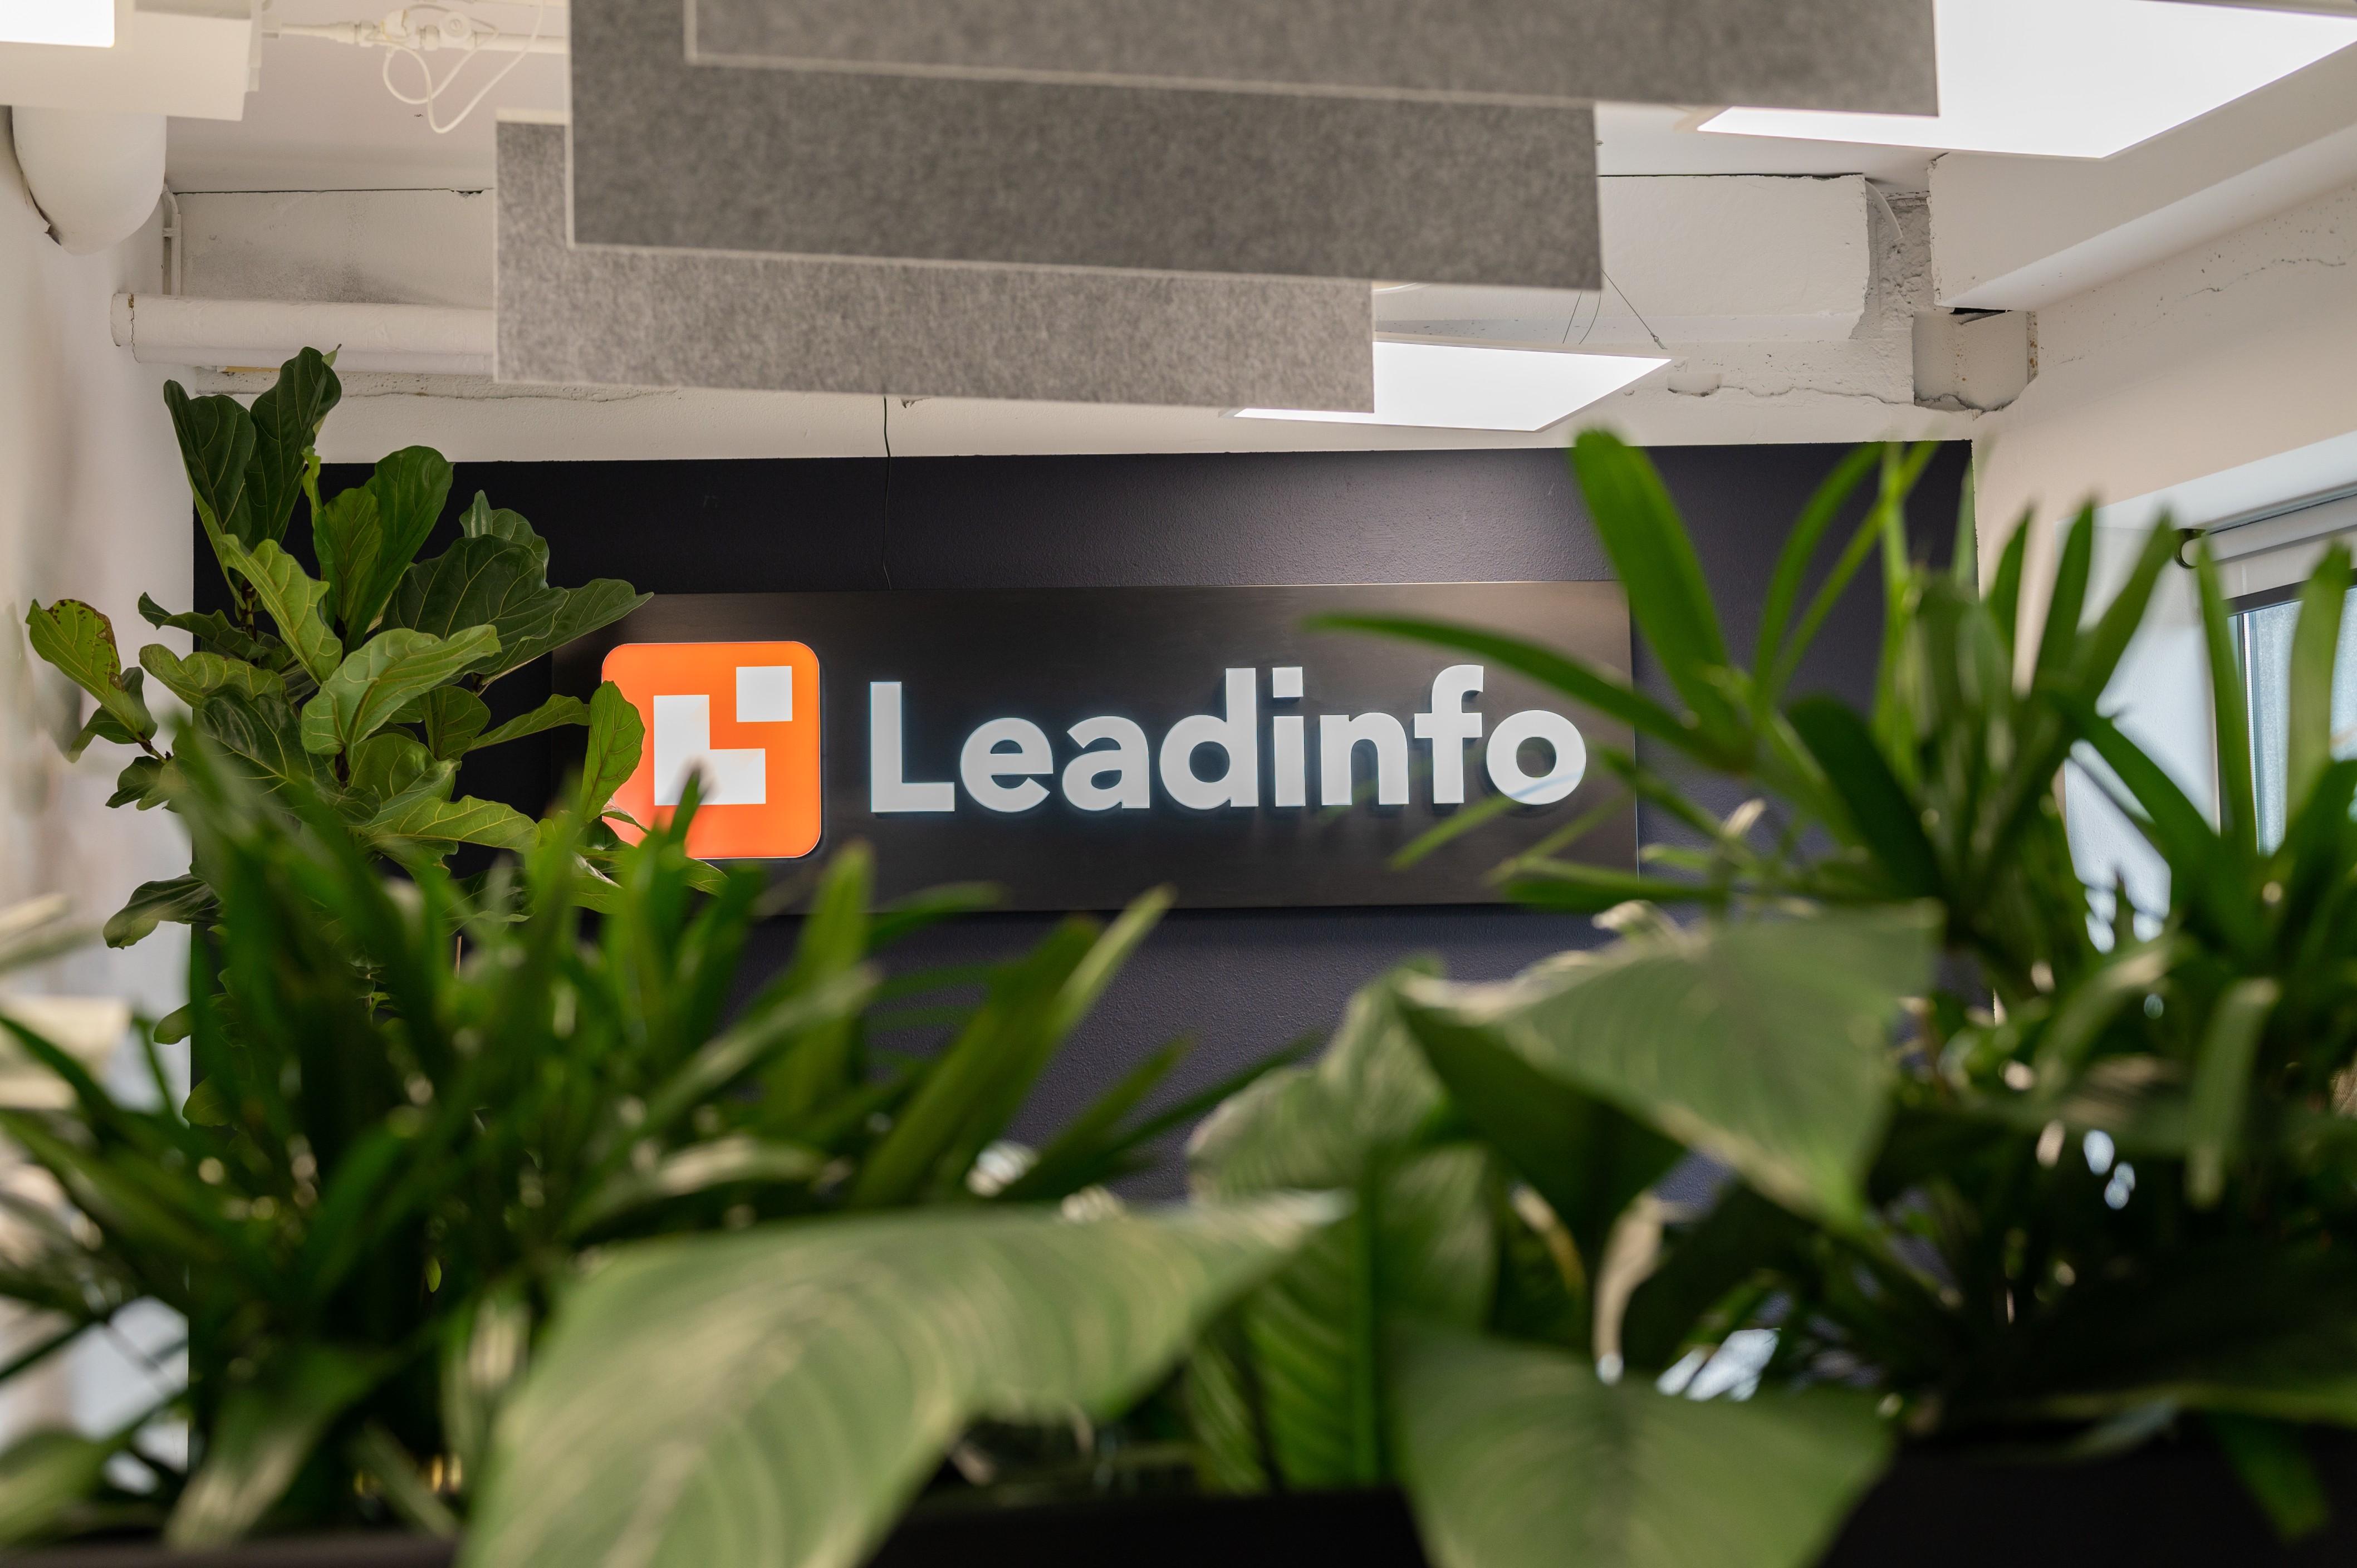 Leadinfo office photo